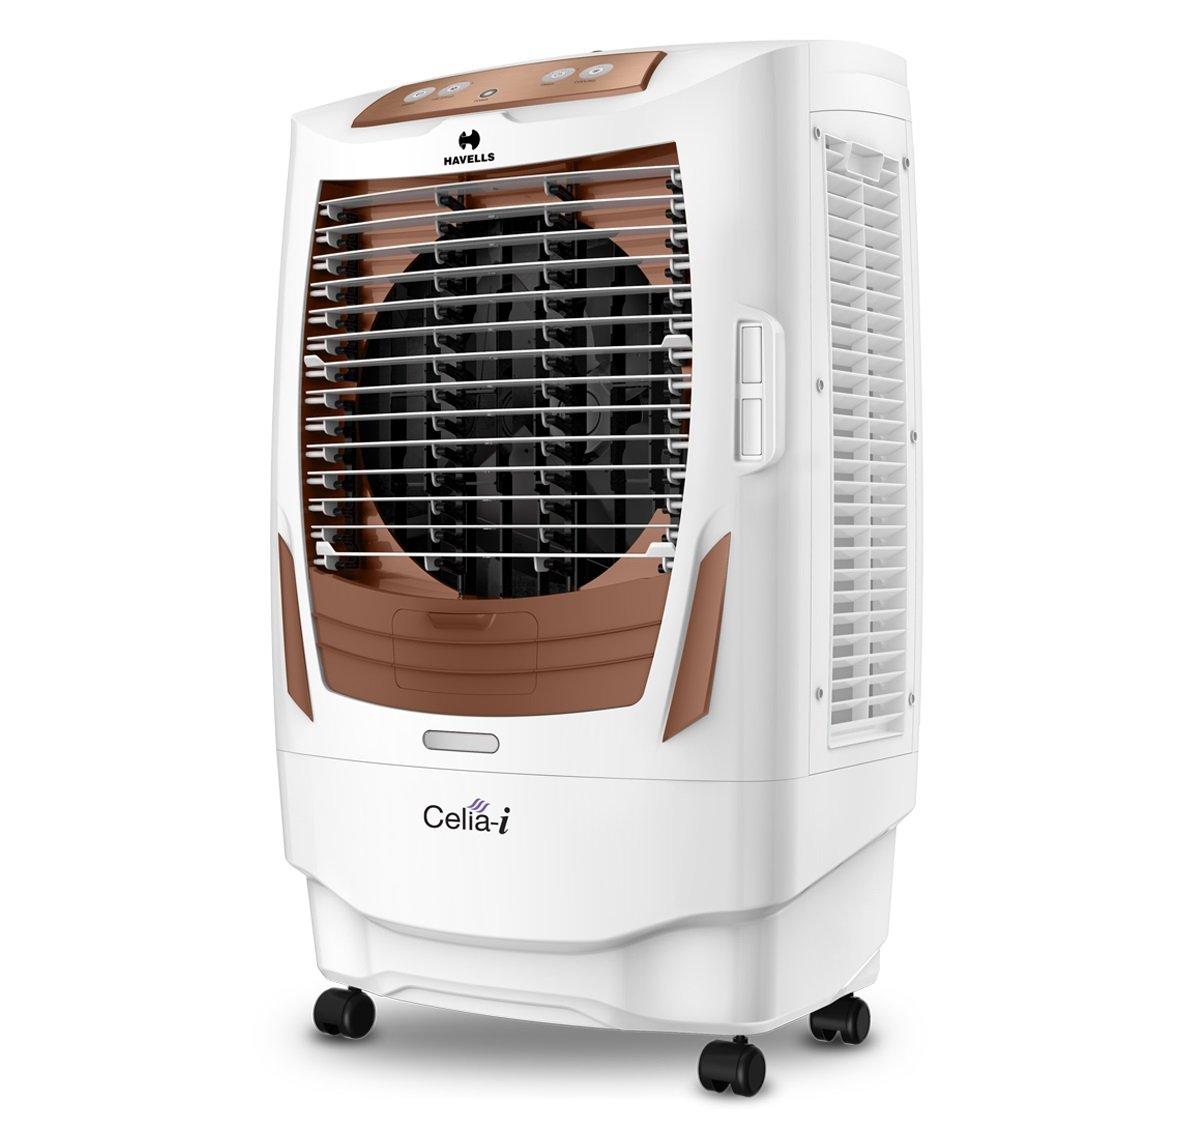 Havells Celia I Desert Air Cooler - 55 litres (White, Brown